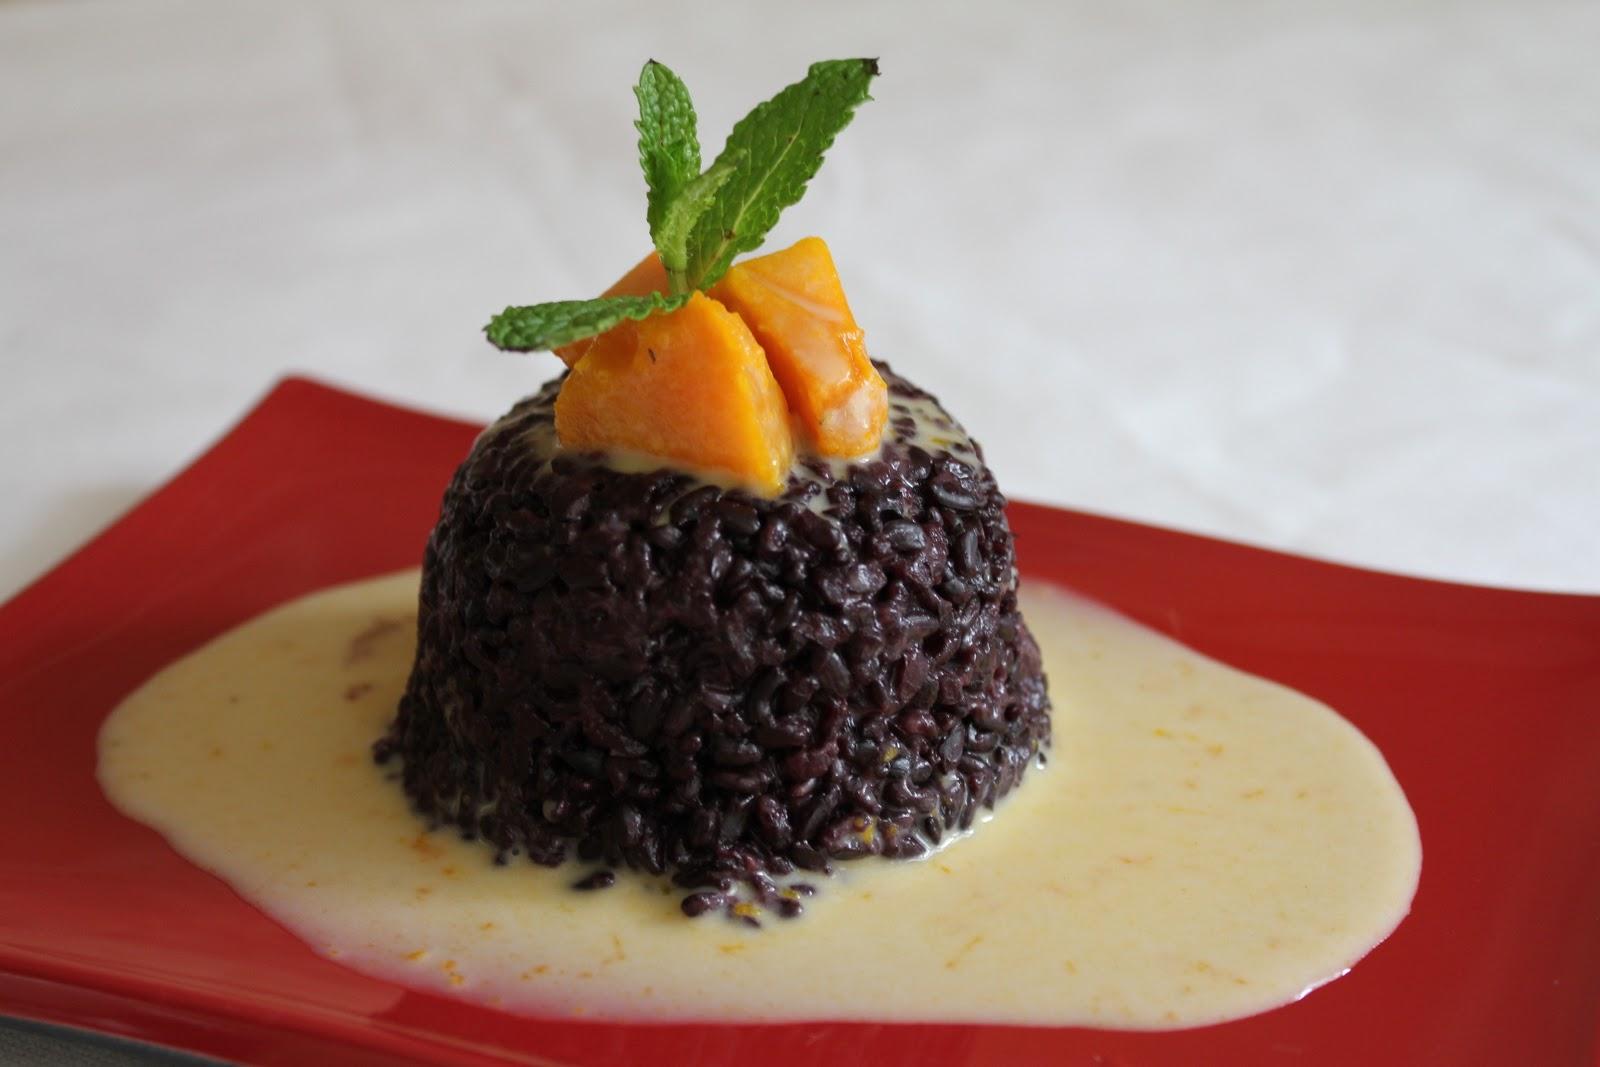 Thai Black Sweet Rice with Kabocha Cream